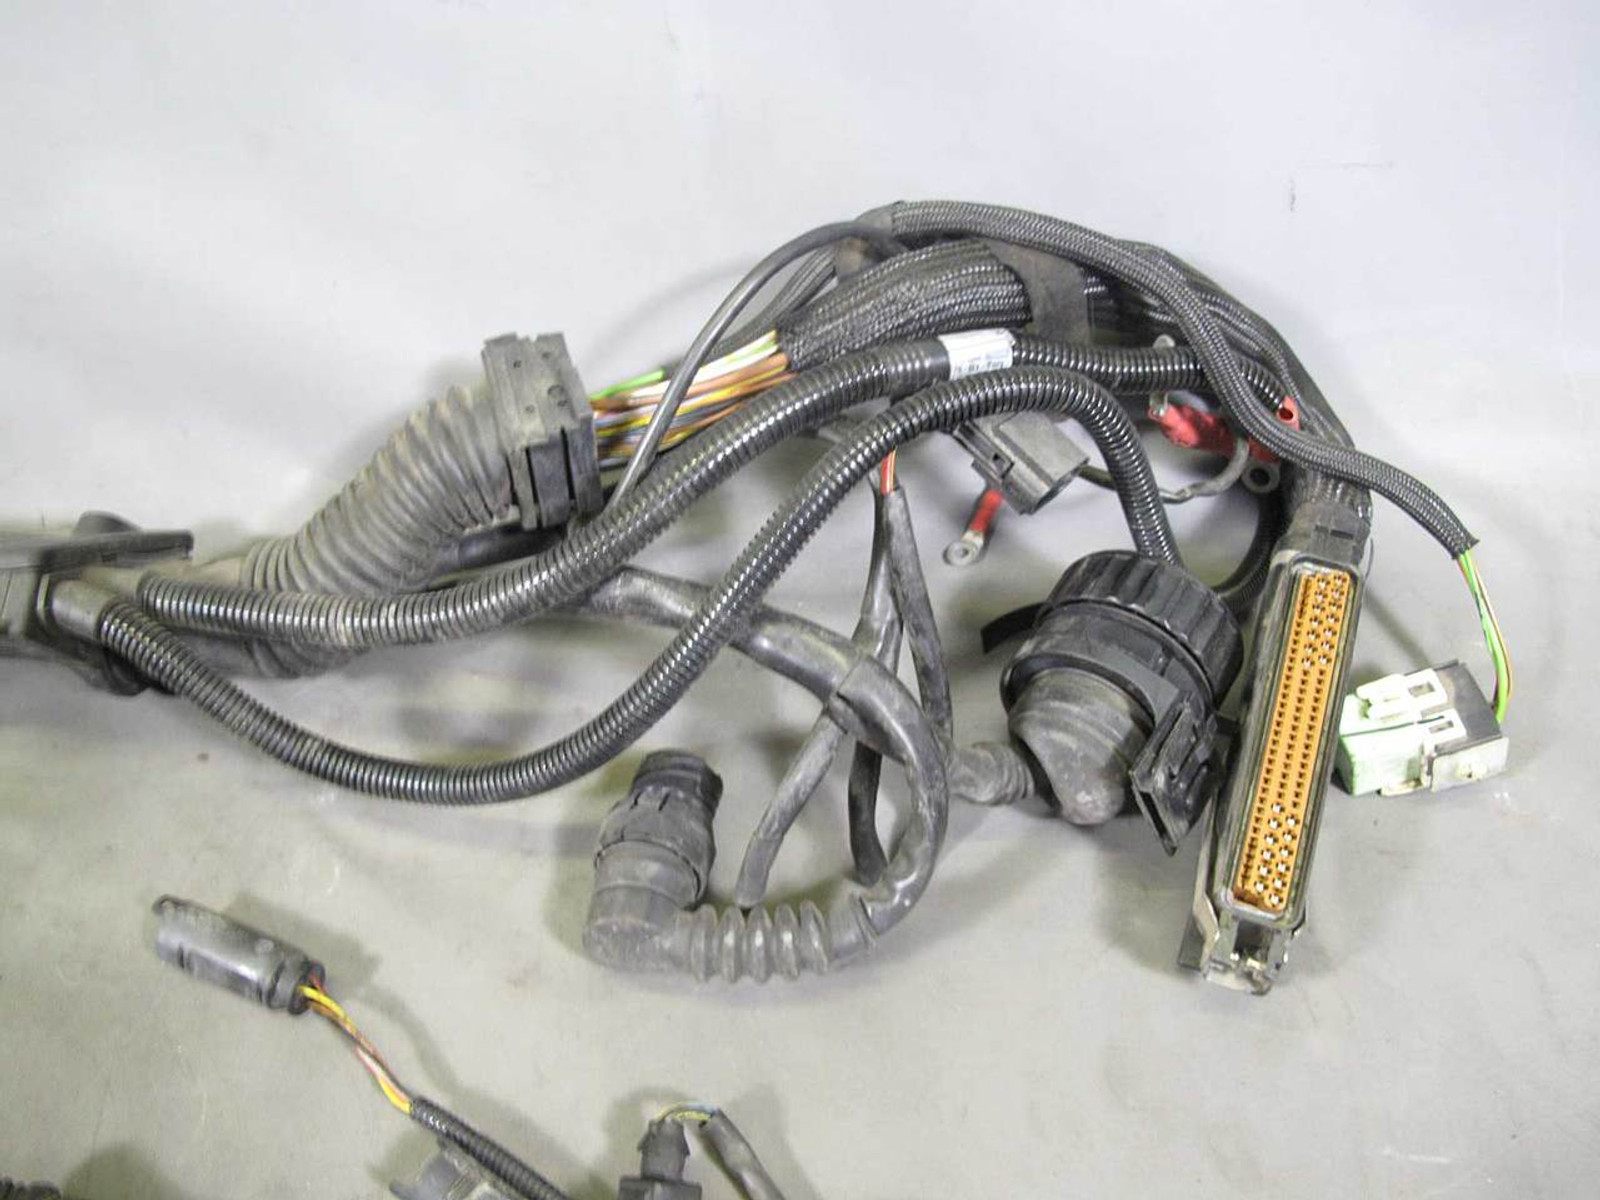 medium resolution of 328i wiring harness trusted wiring diagram rh 8 4 1 gartenmoebel rupp de 1997 bmw 328i